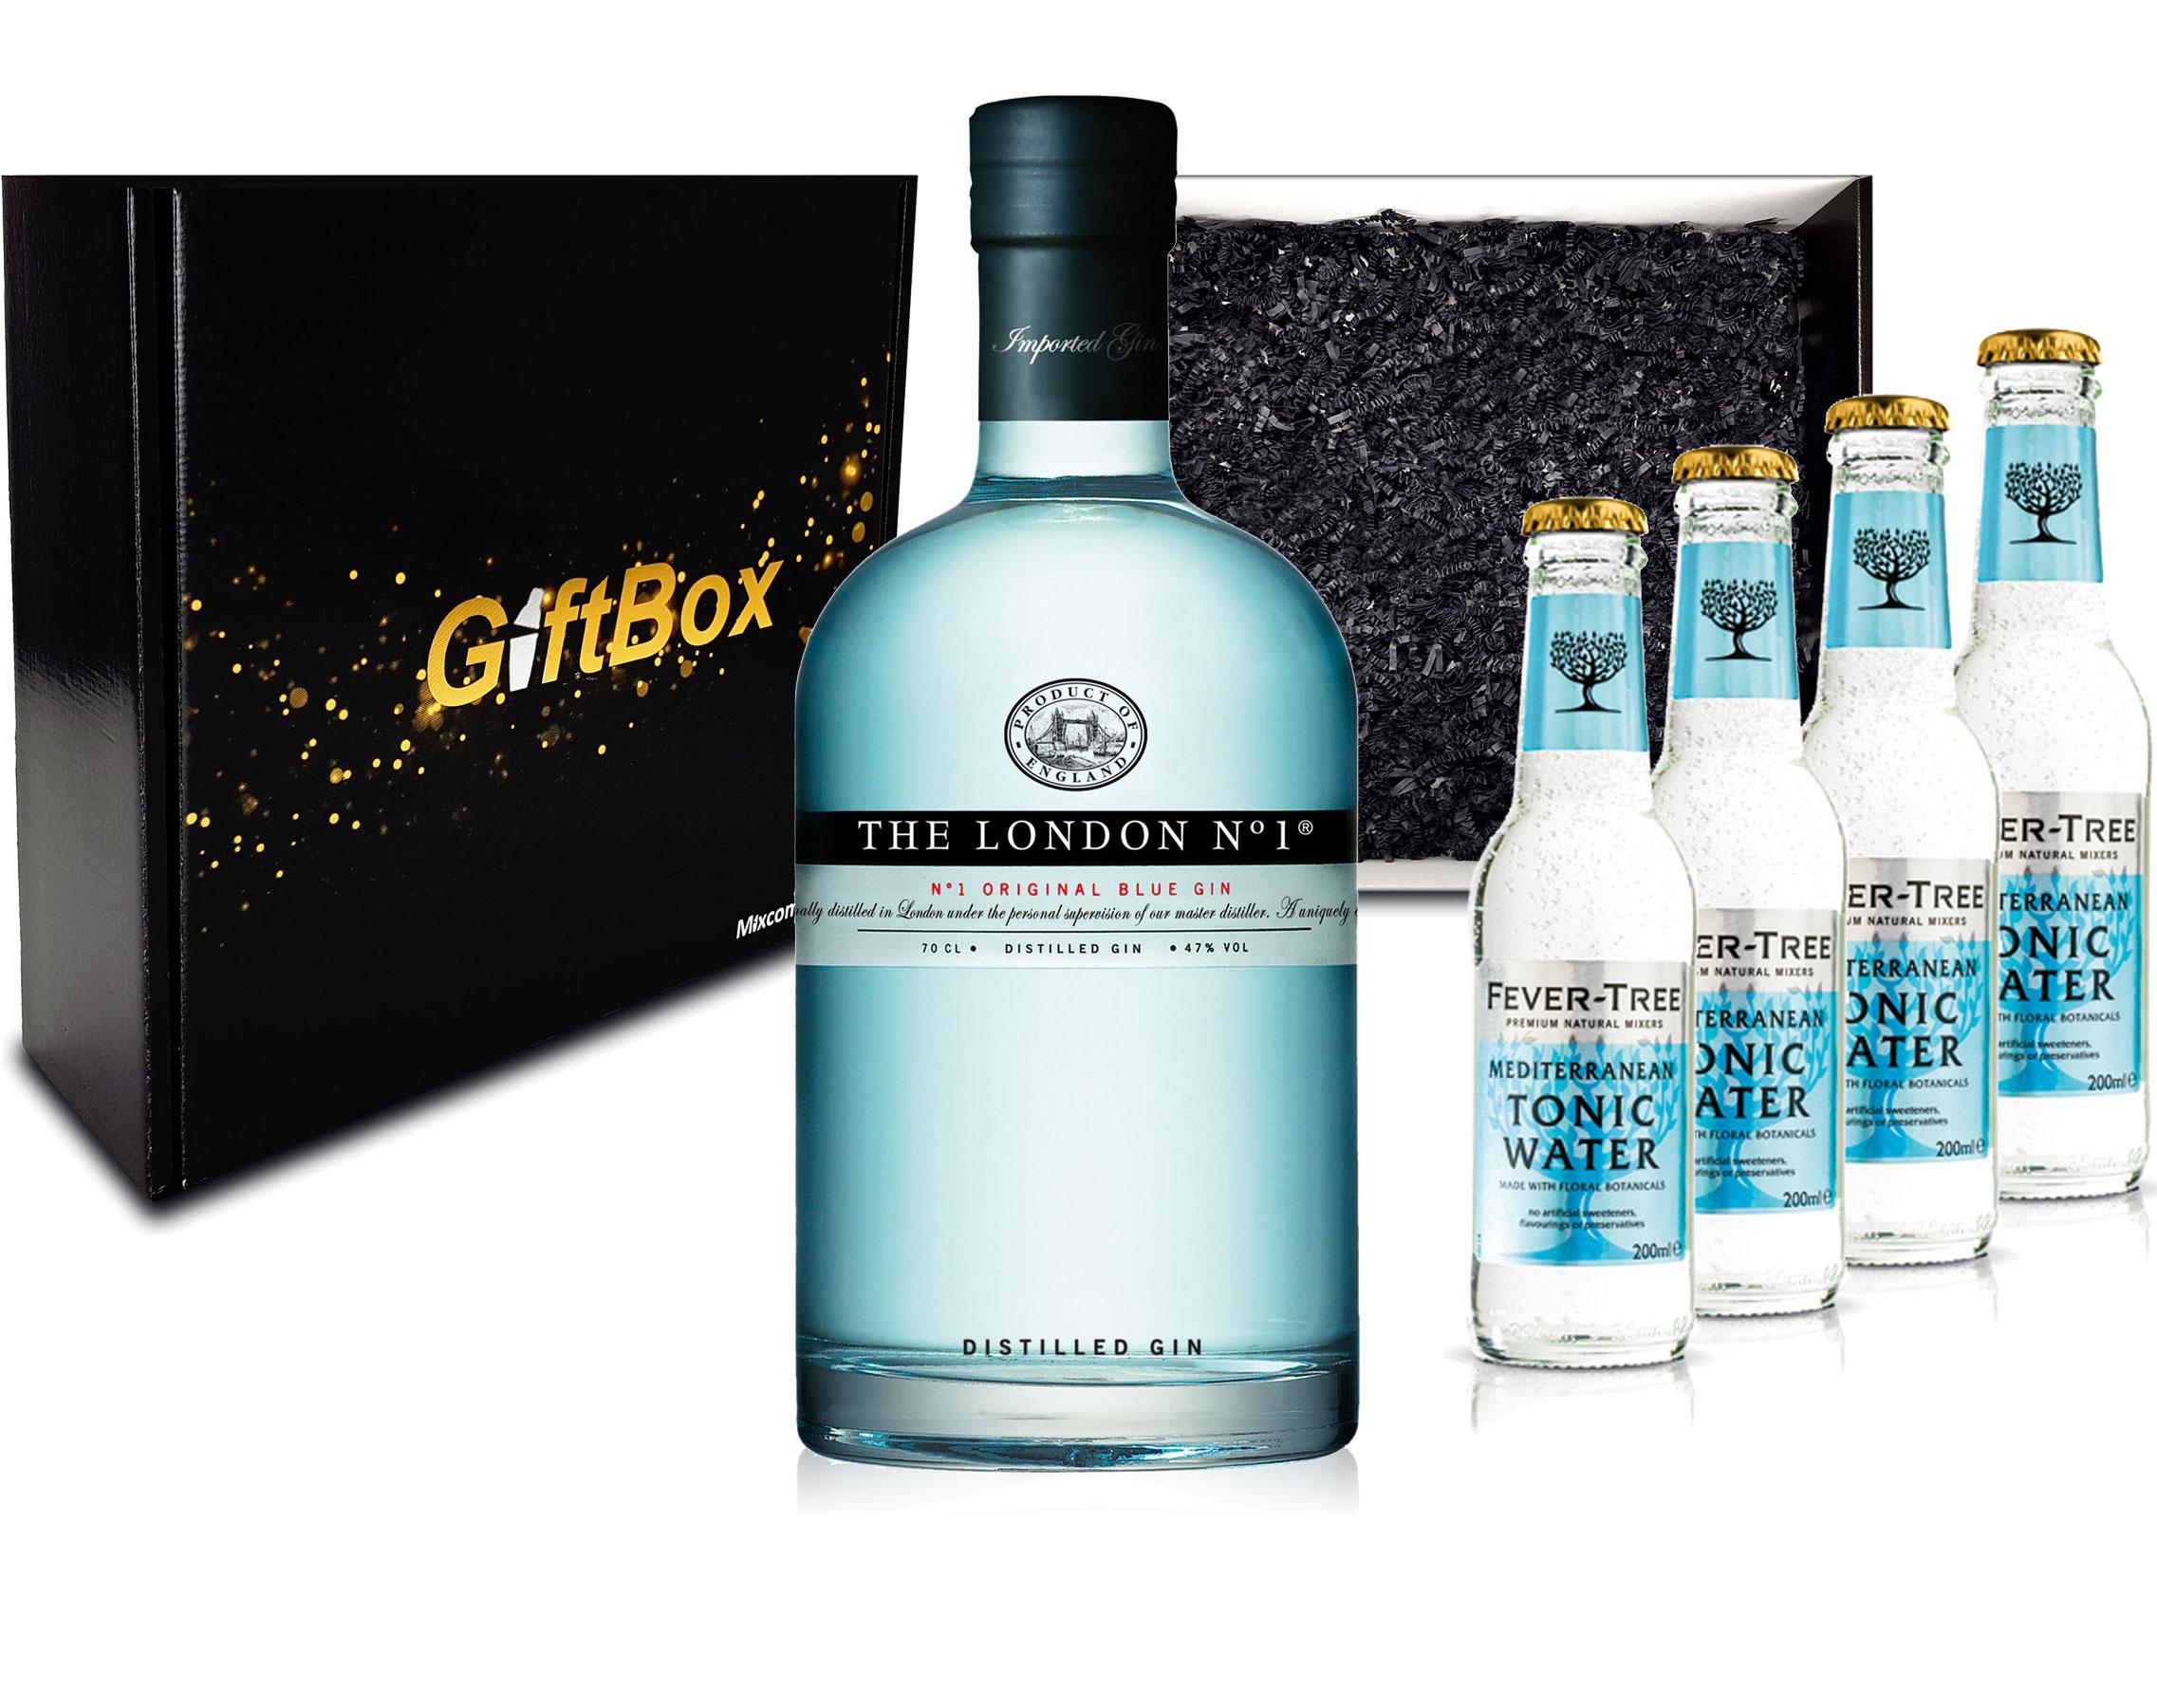 Gin Tonic Giftbox Geschenkset - The London N1 Blue Gin 0,7l 700ml (47% Vol) + 4x Fever Tree Mediterranean Tonic Water 200ml inkl. Pfand MEHRWEG + Geschenkverpackung